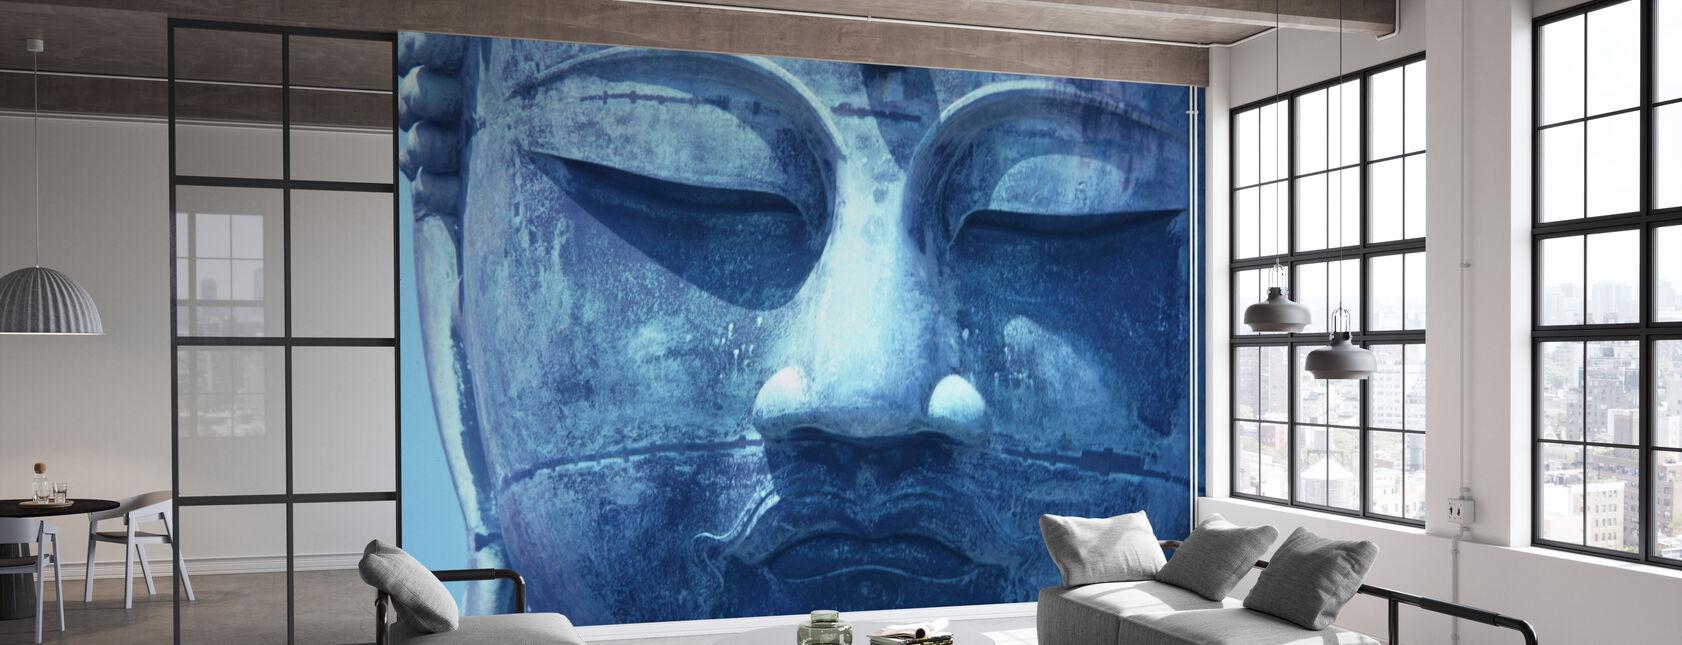 Bouddha bleu - Papier peint - Bureau